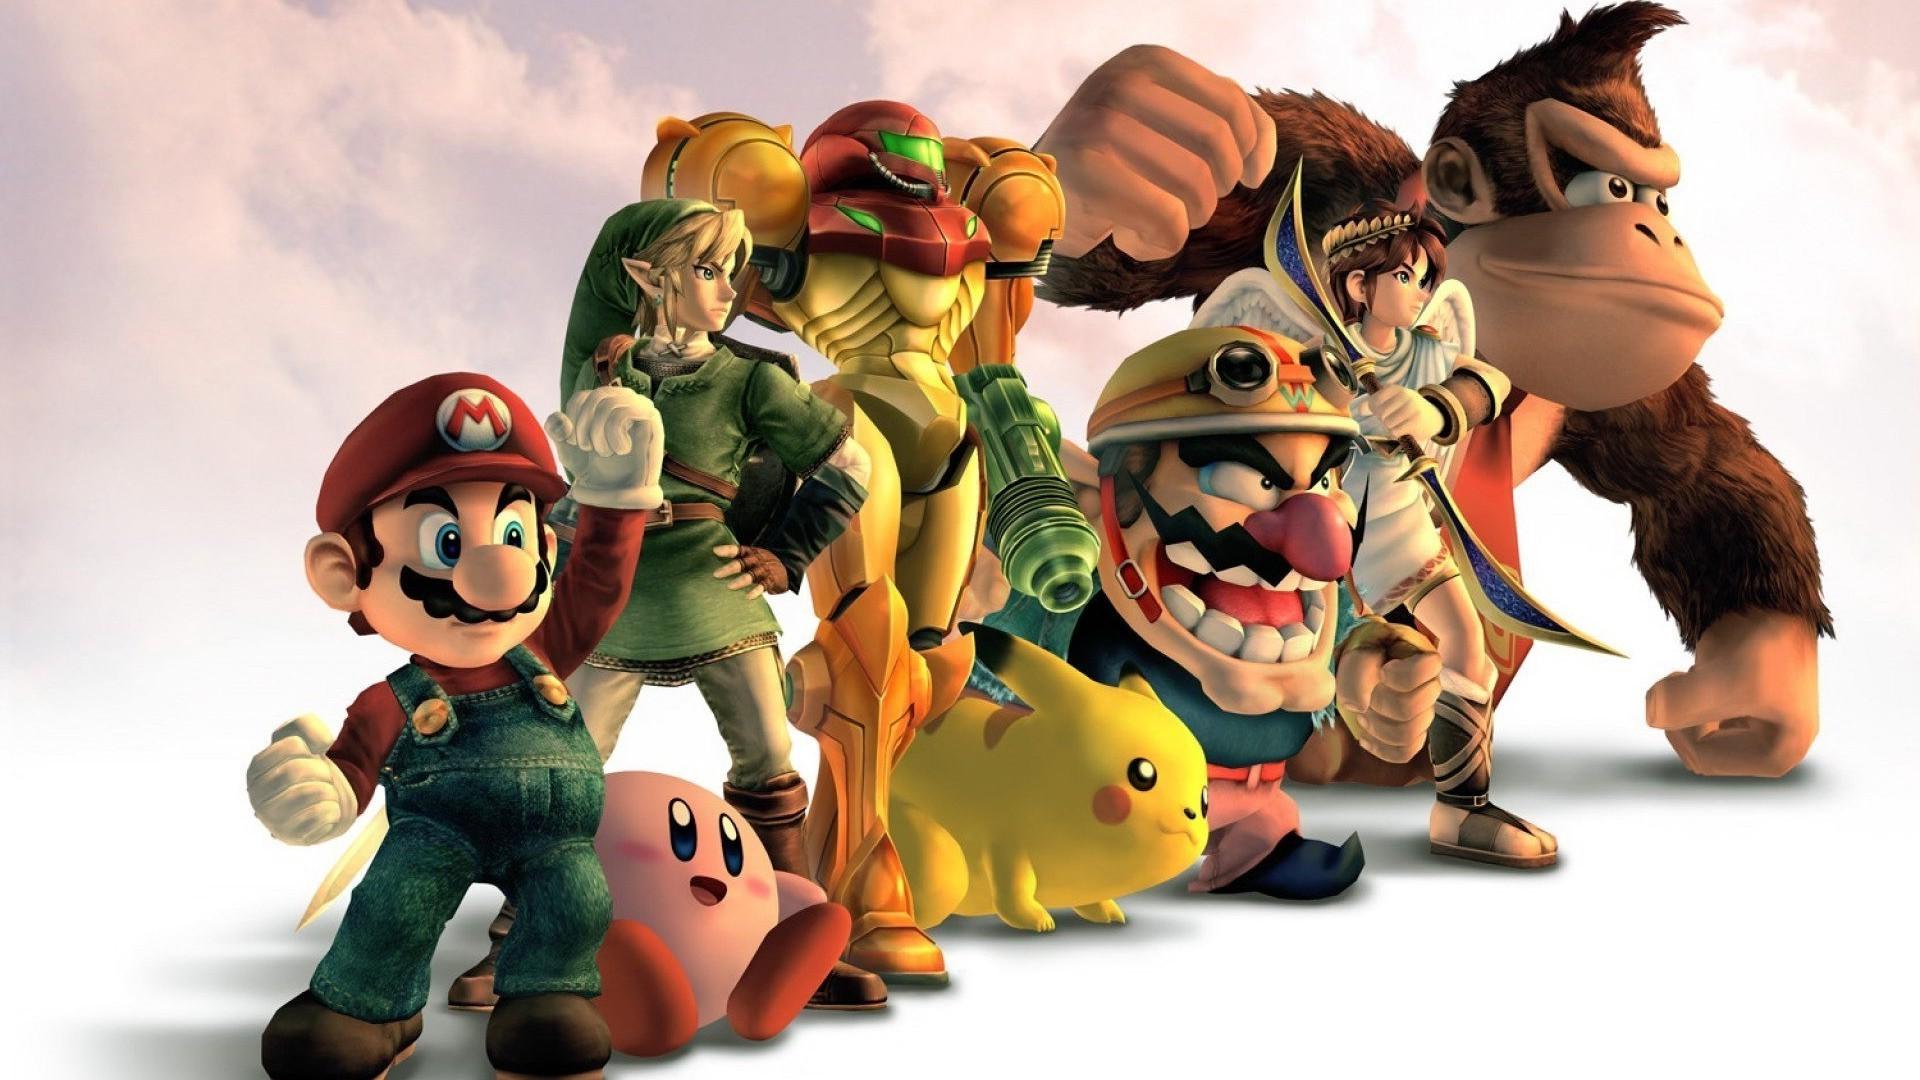 1920x1080 Px Donkey Kong Kirby Link Metroid Pikachu Samus Aran Super Mario The Legend Of Zelda